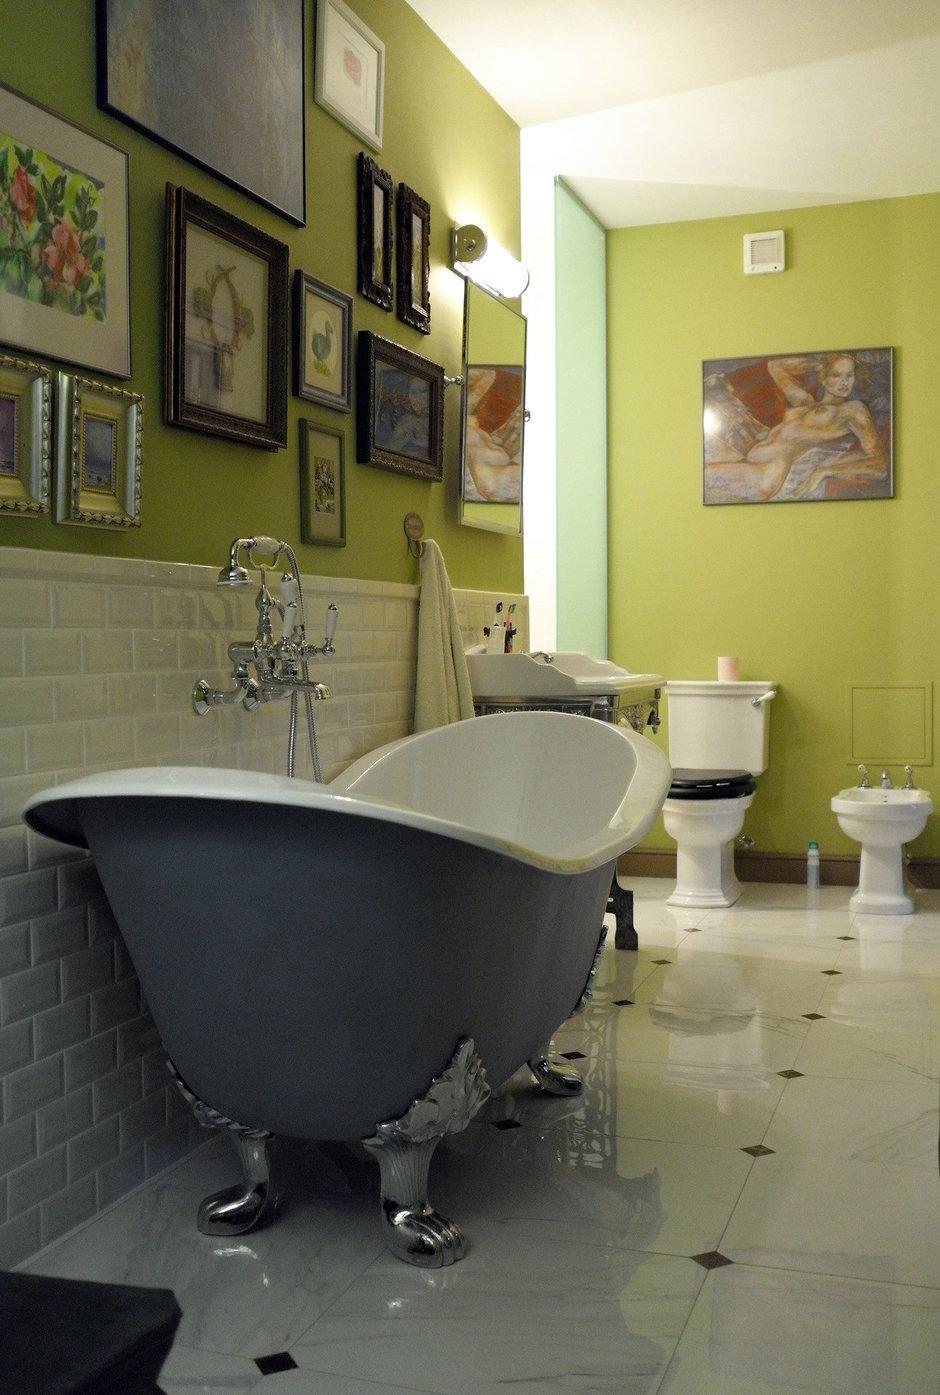 Фотография: Ванная в стиле , Квартира, Eichholtz, Spiridon, Дома и квартиры, Проект недели – фото на InMyRoom.ru